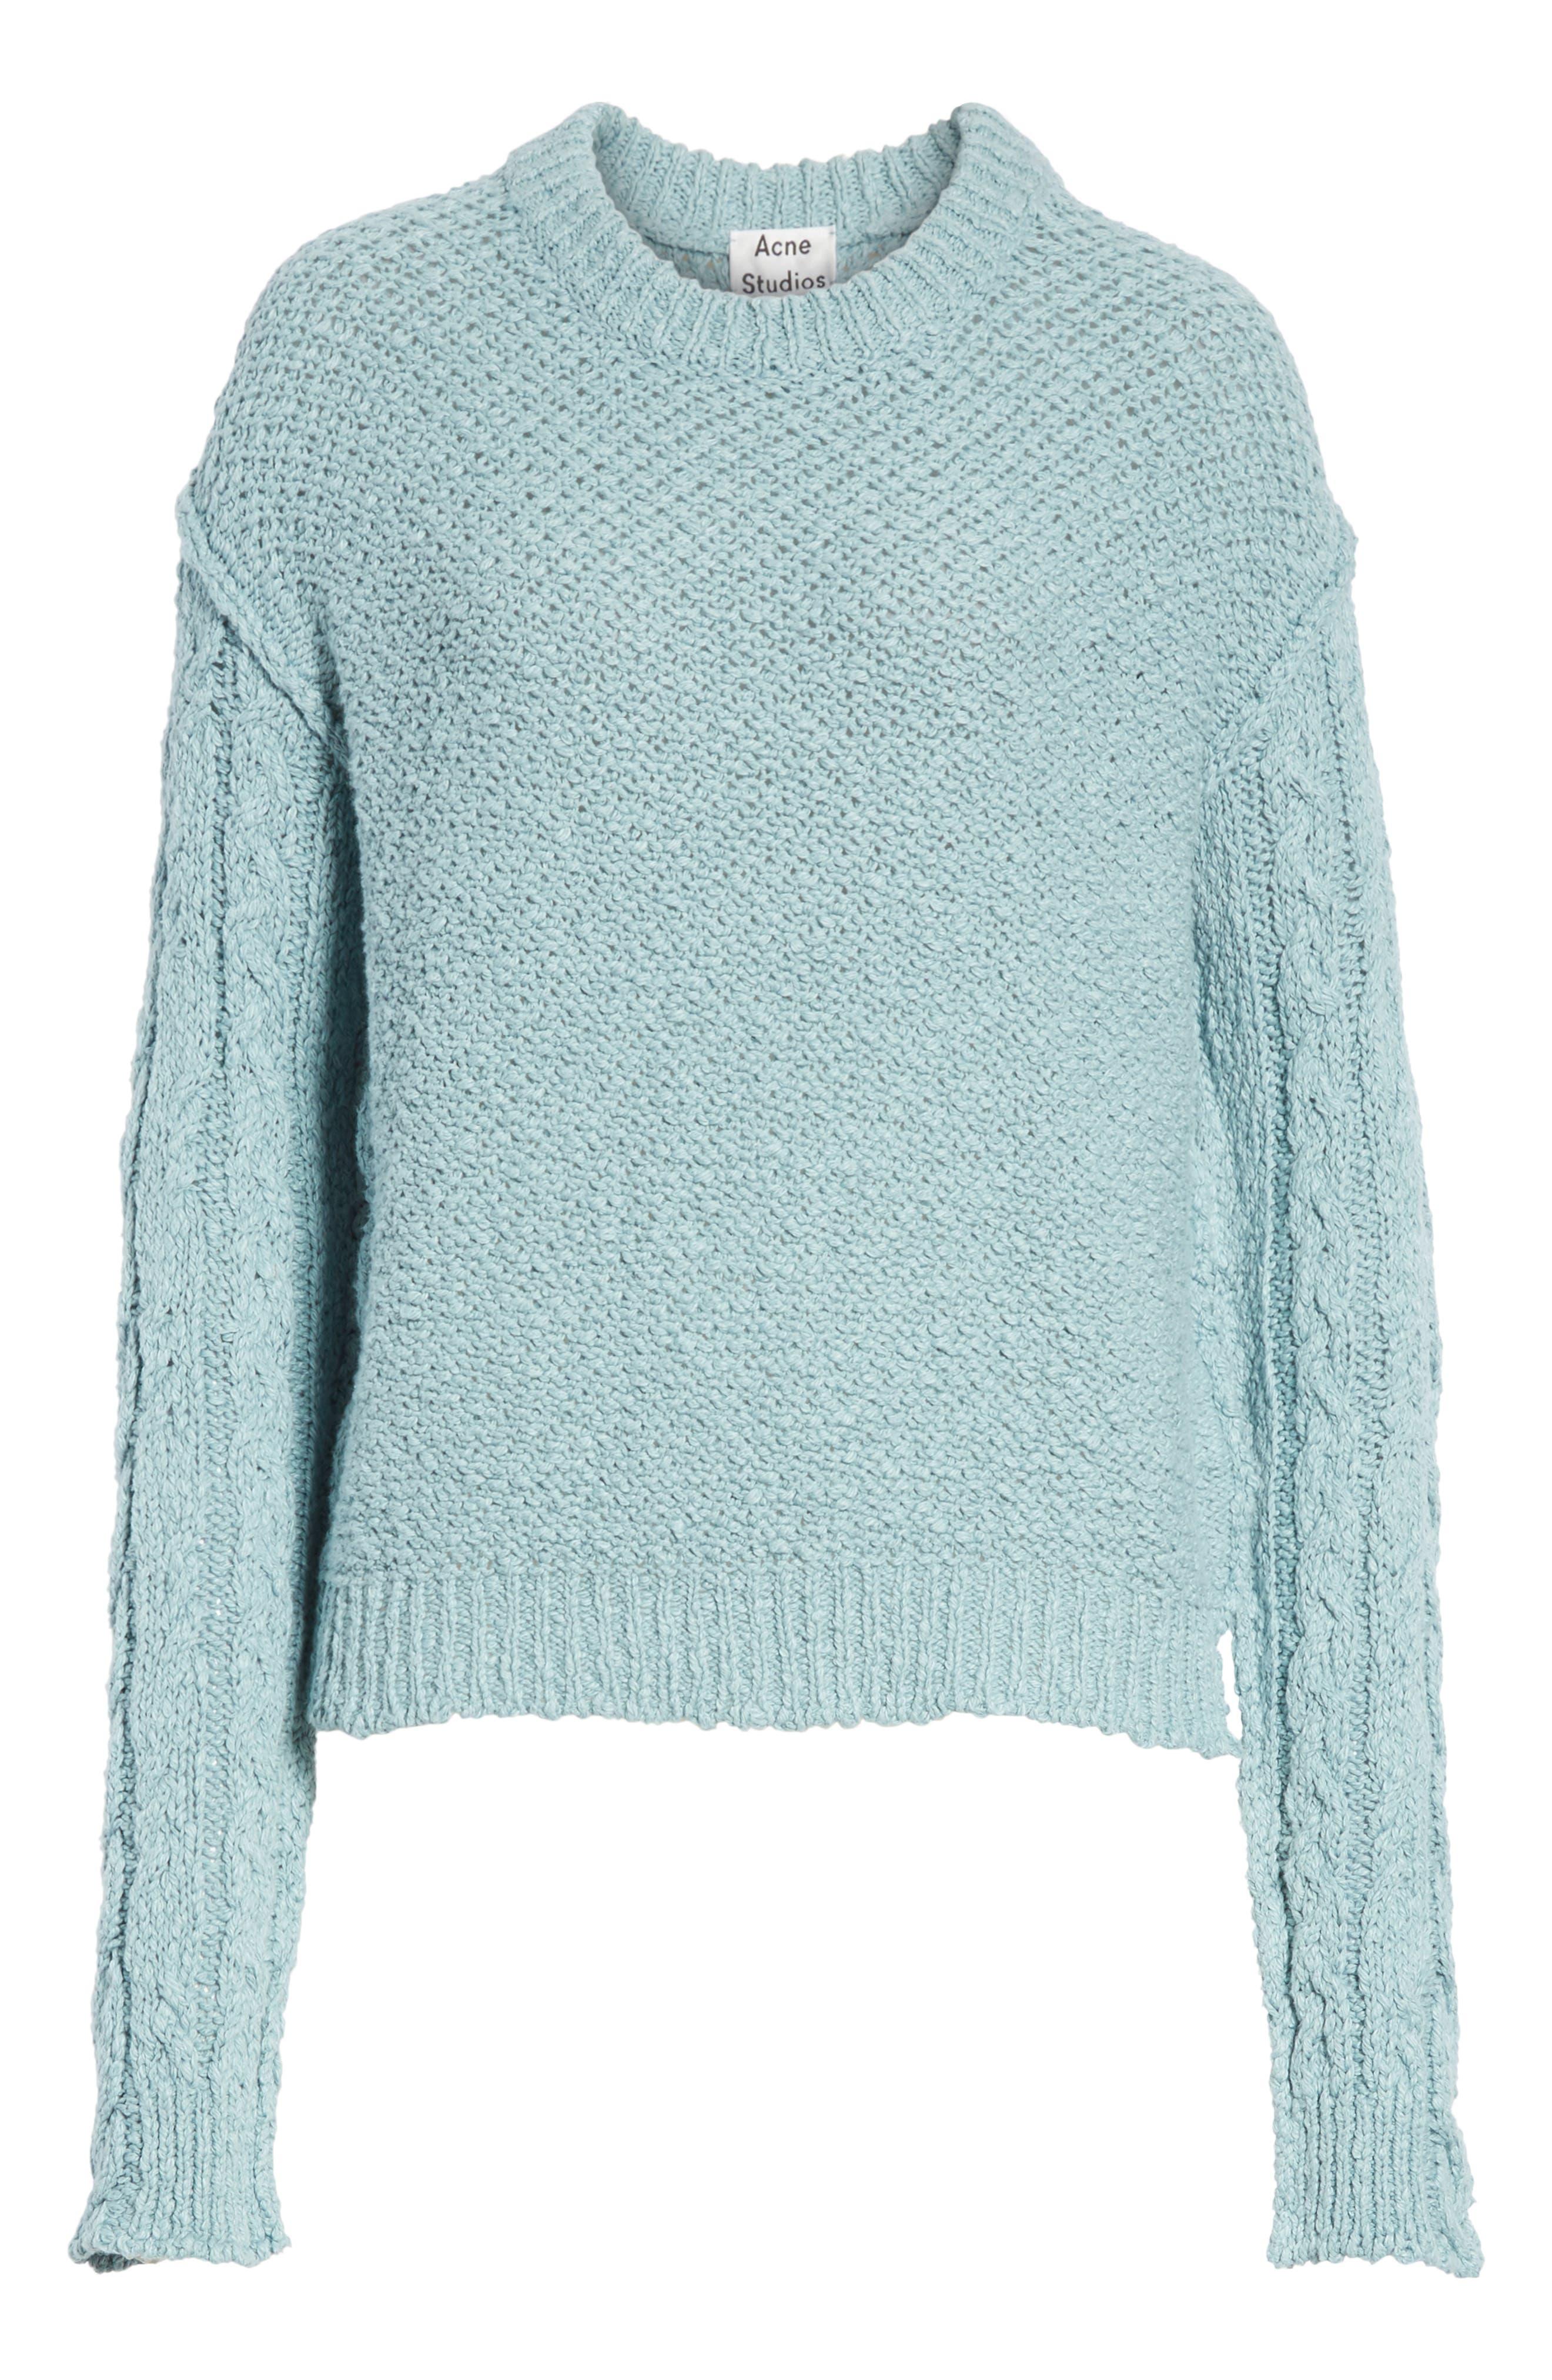 Hila Cable Sleeve Sweater,                             Main thumbnail 1, color,                             Blue